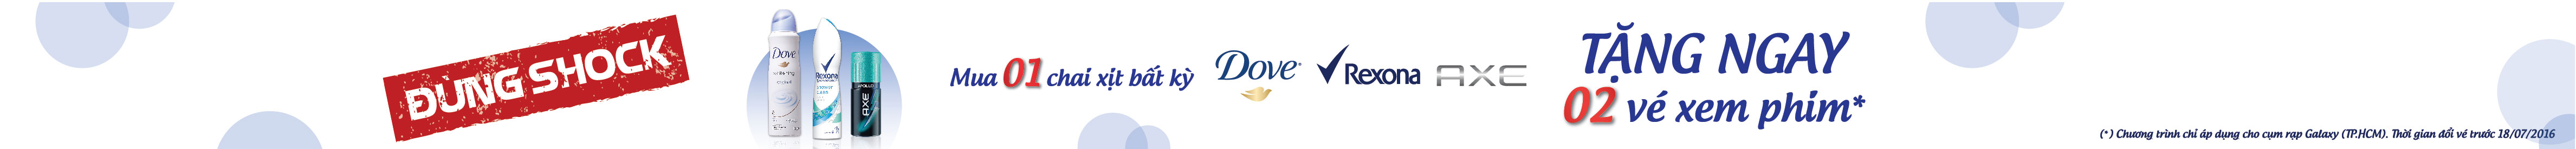 Dove, Axe, Rexona xịt khử mùi